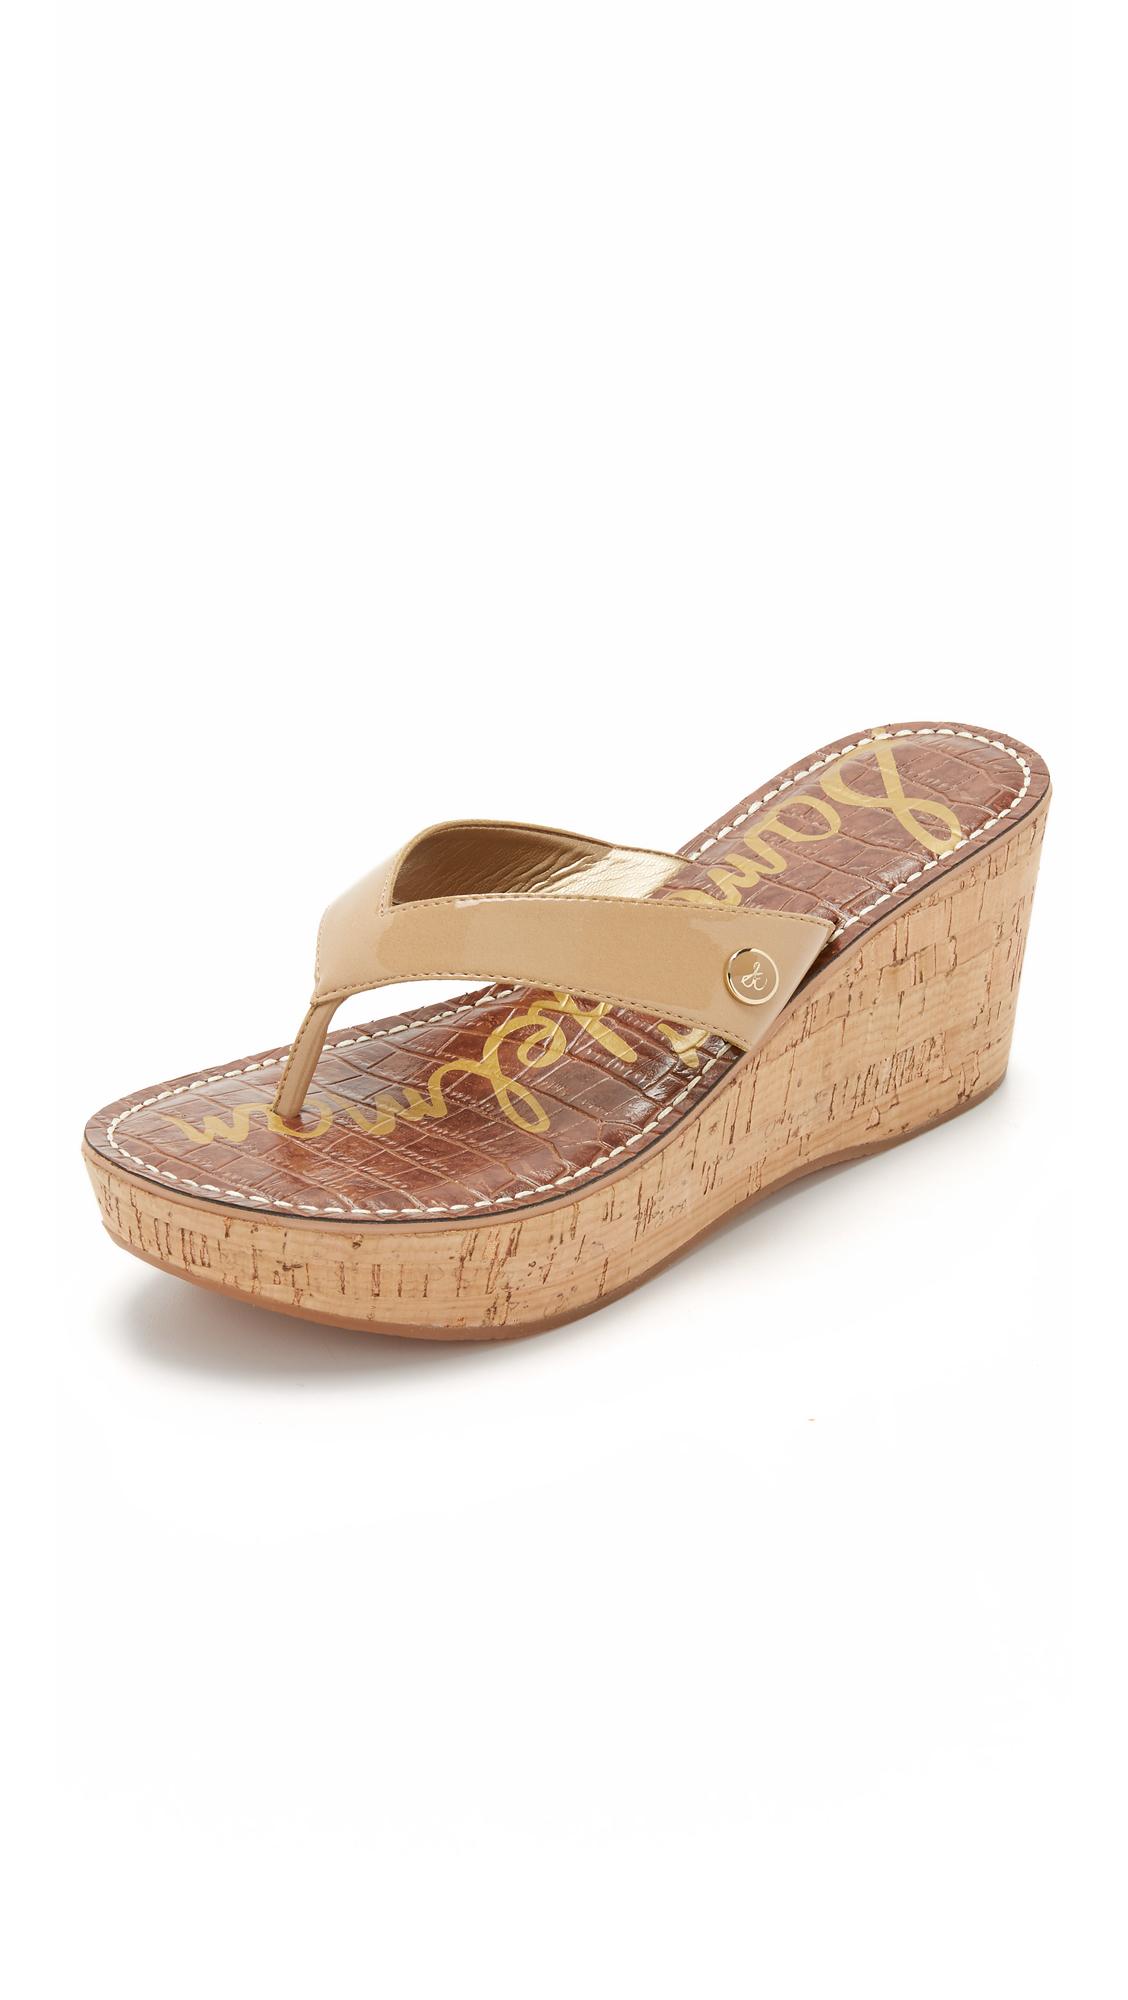 Sam Edelman Romy Wedge Thong Sandals In Almond Brown Lyst